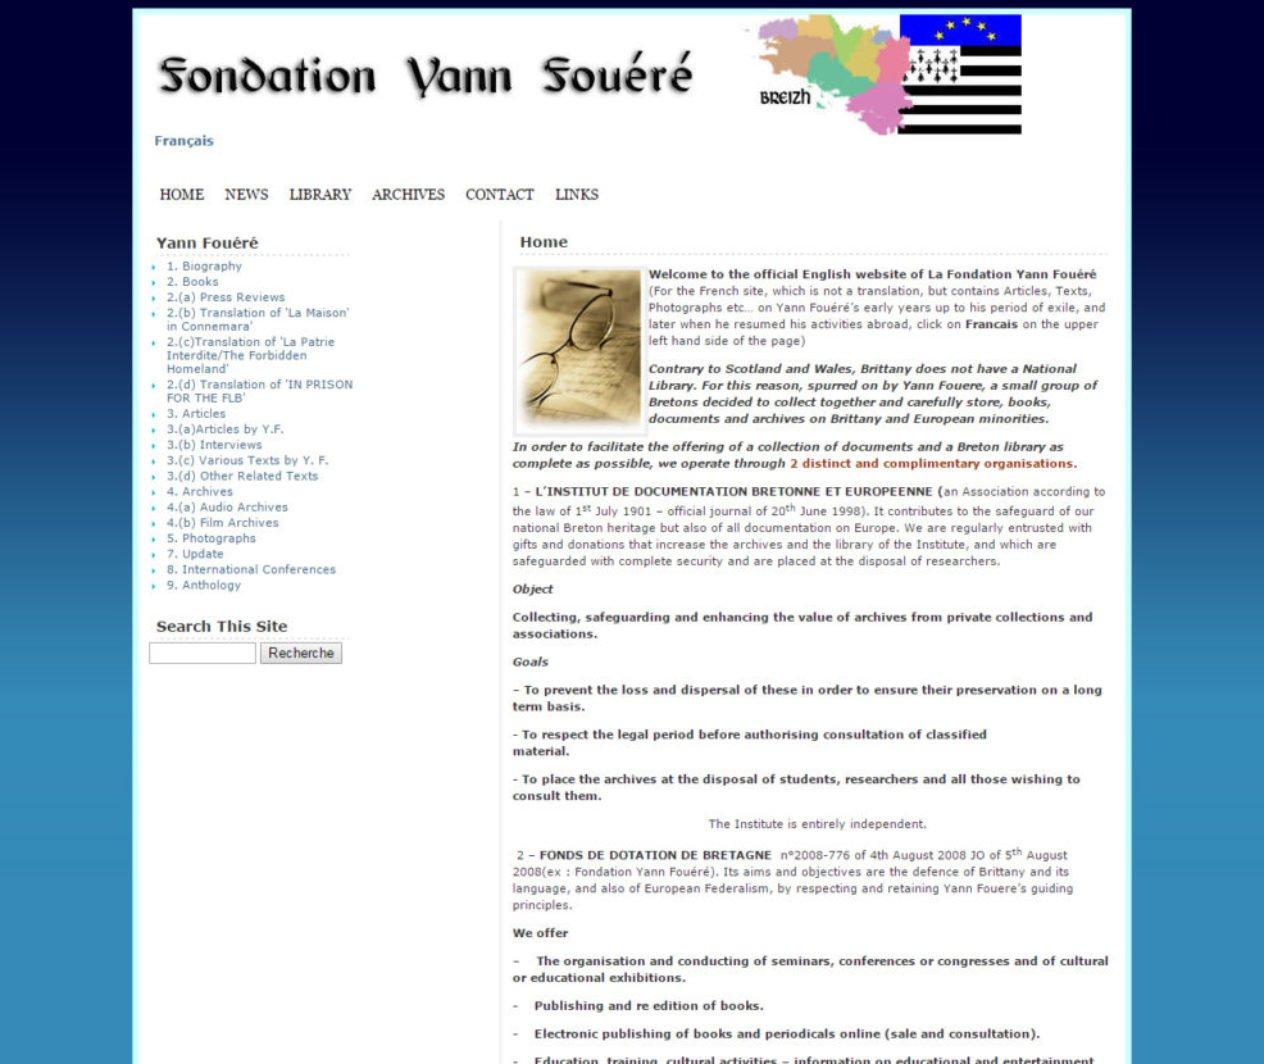 Fondation Yann Fouere